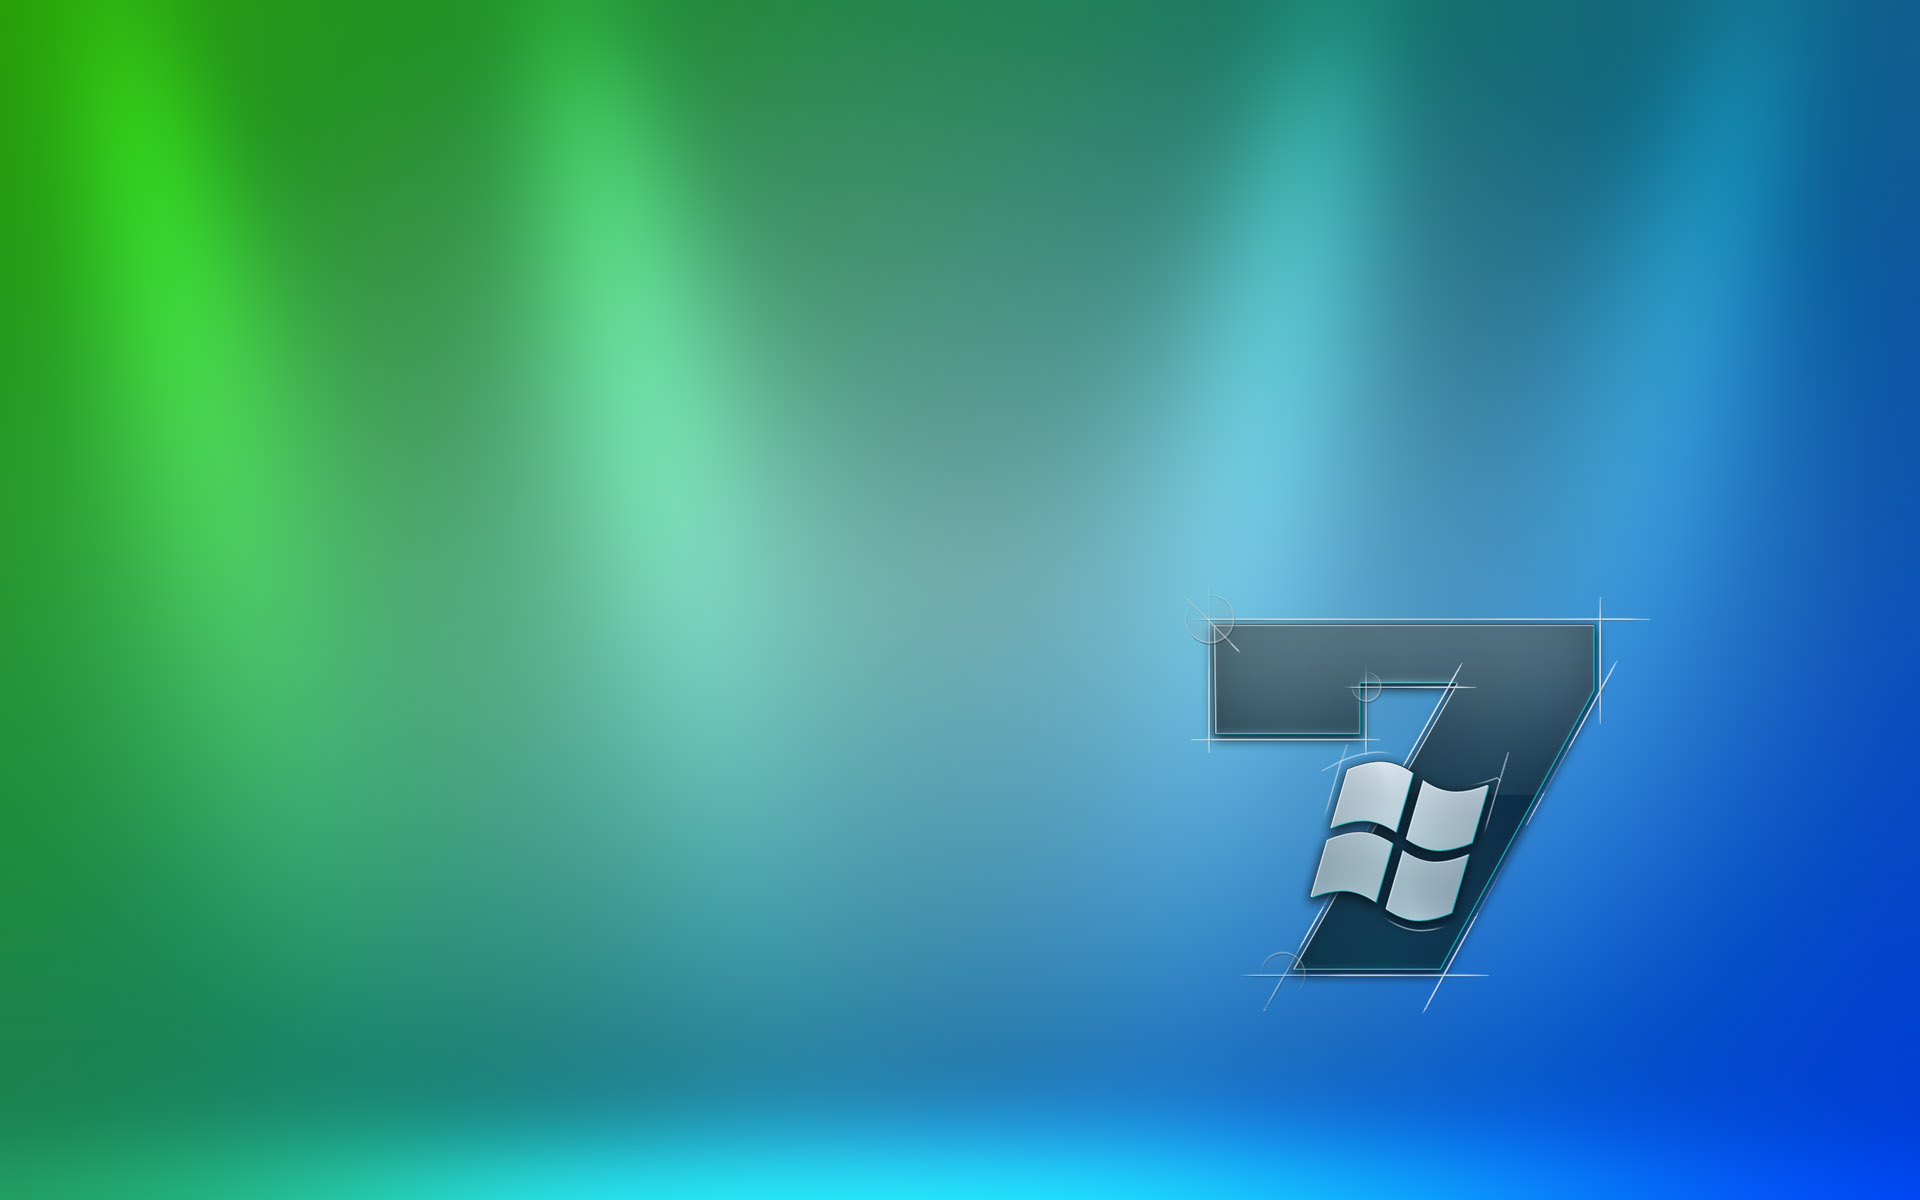 Windows Desktop Wallpaper - Desktop Background Windows 7 In High Resolution - HD Wallpaper